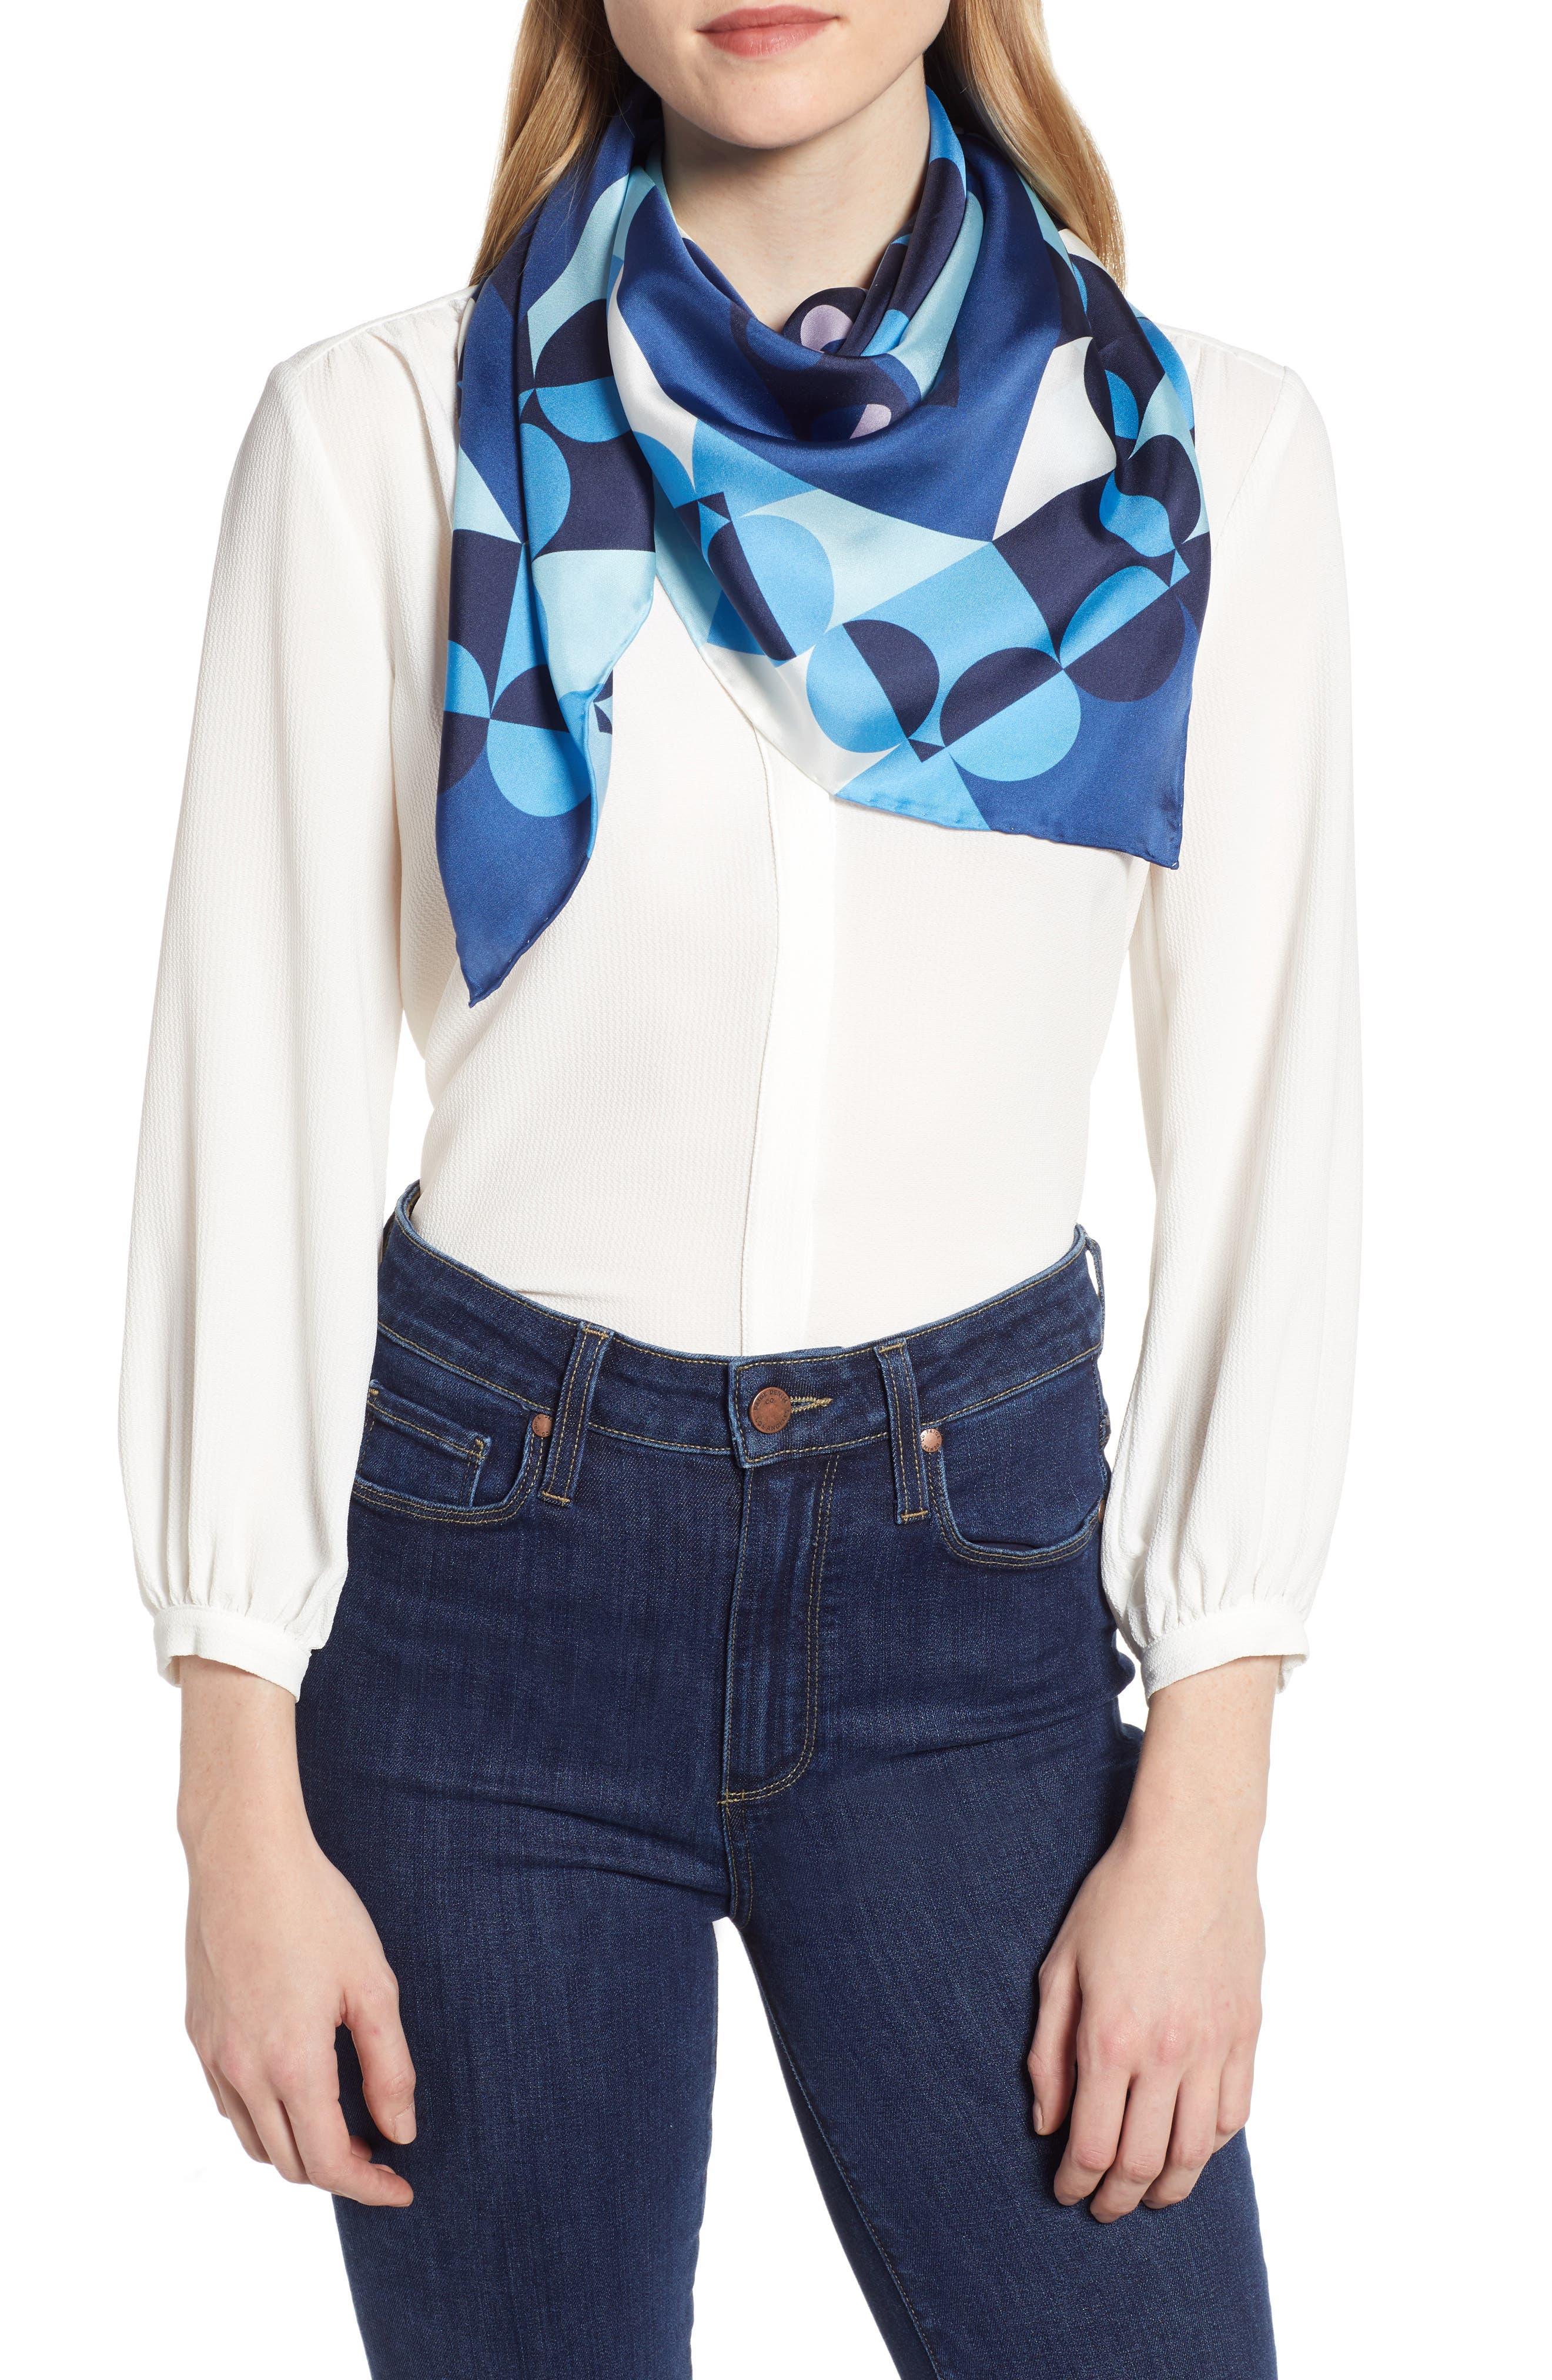 KATE SPADE NEW YORK,                             geospade square silk scarf,                             Main thumbnail 1, color,                             AMULET BLUE